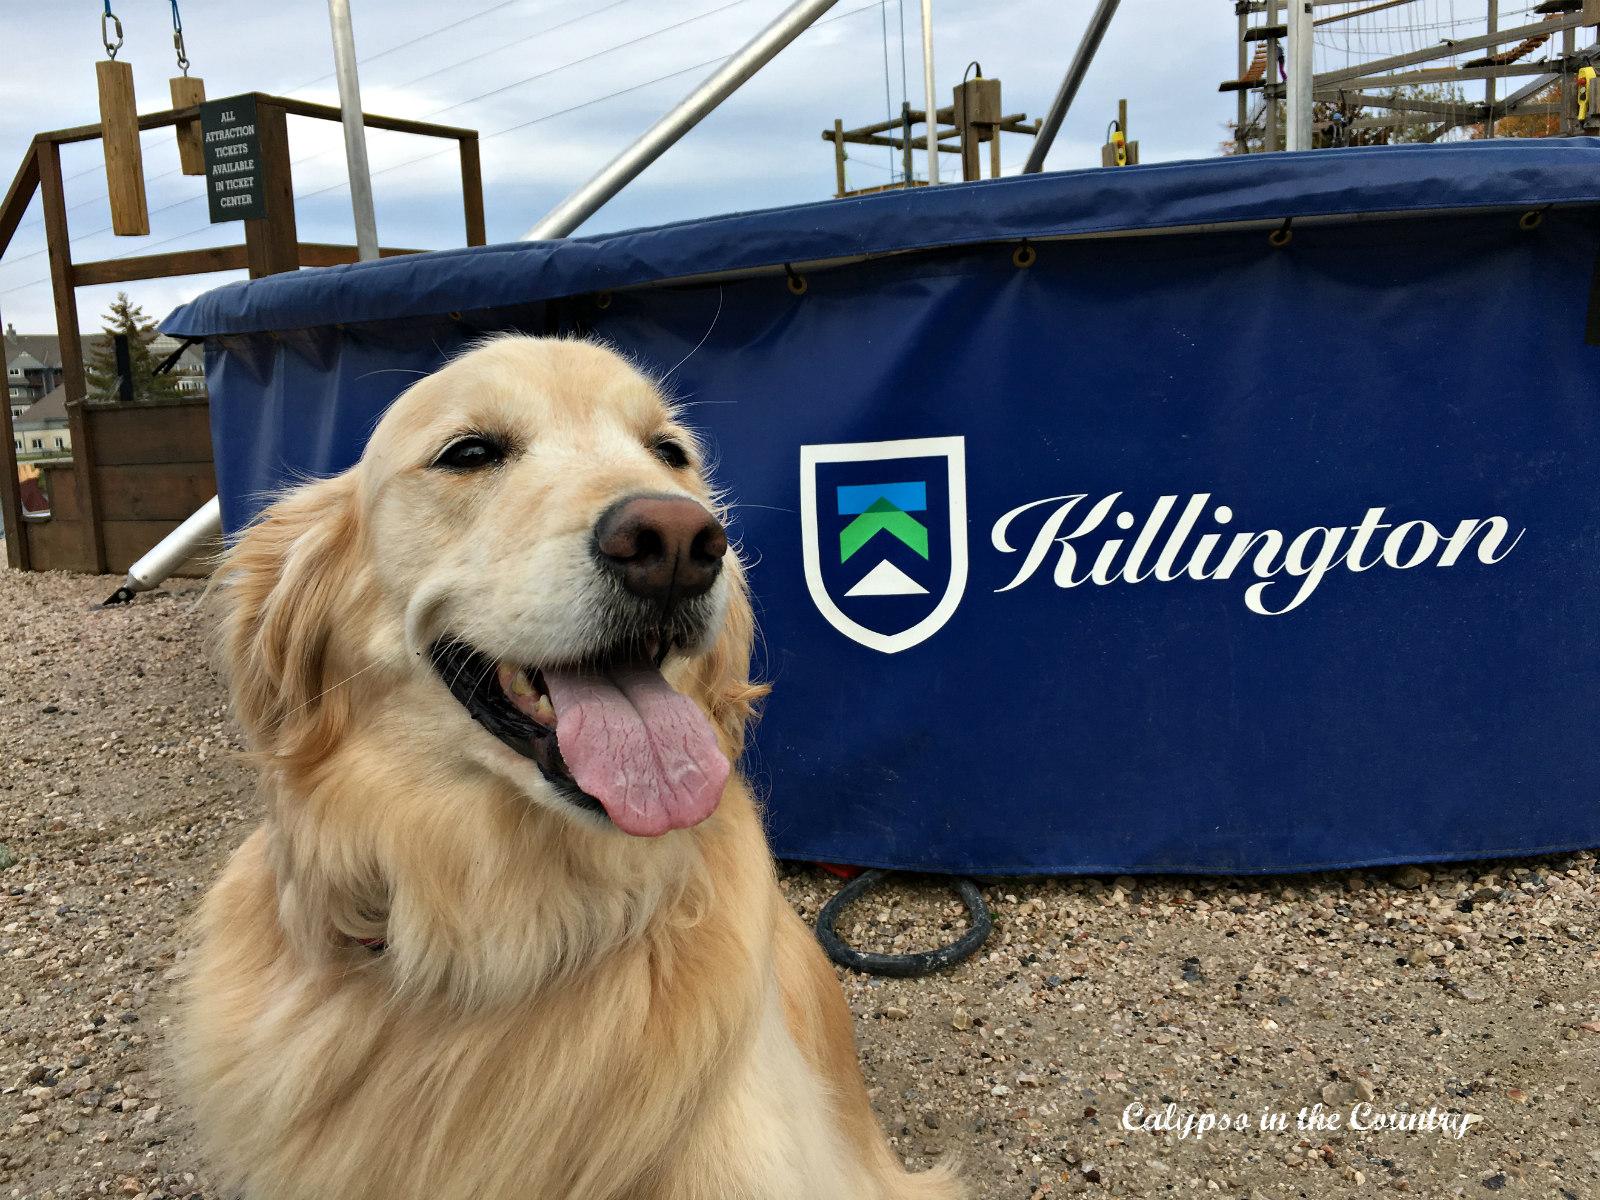 Killington Vermont Adventure Center with golden retriever